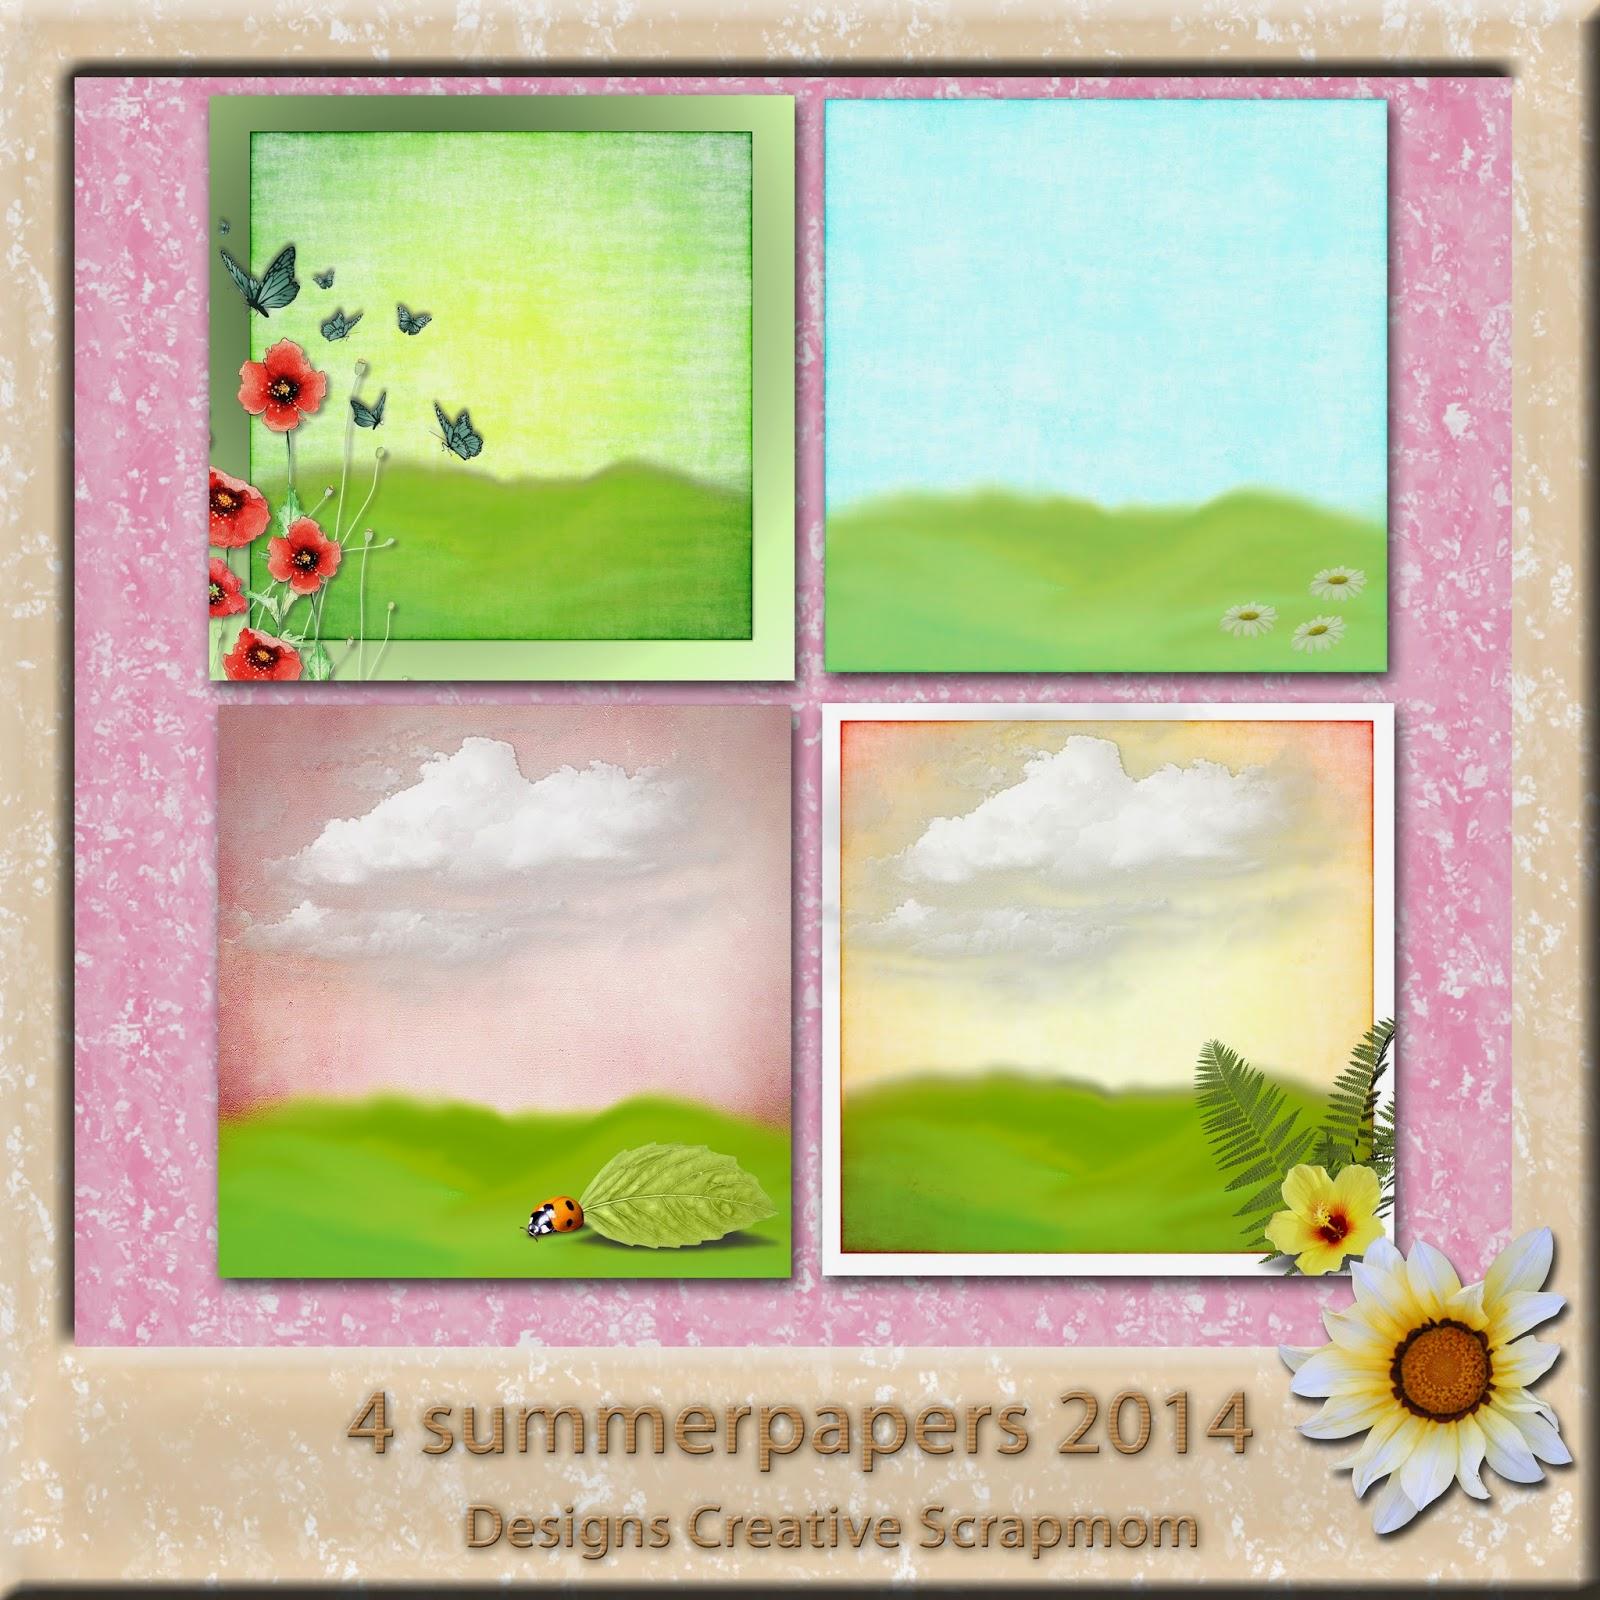 http://4.bp.blogspot.com/-Duy0JwCrbvs/U3sY_Qogd-I/AAAAAAAAEQE/jR2EtUPN7J4/s1600/4+summerpapers+2014+preview.jpg